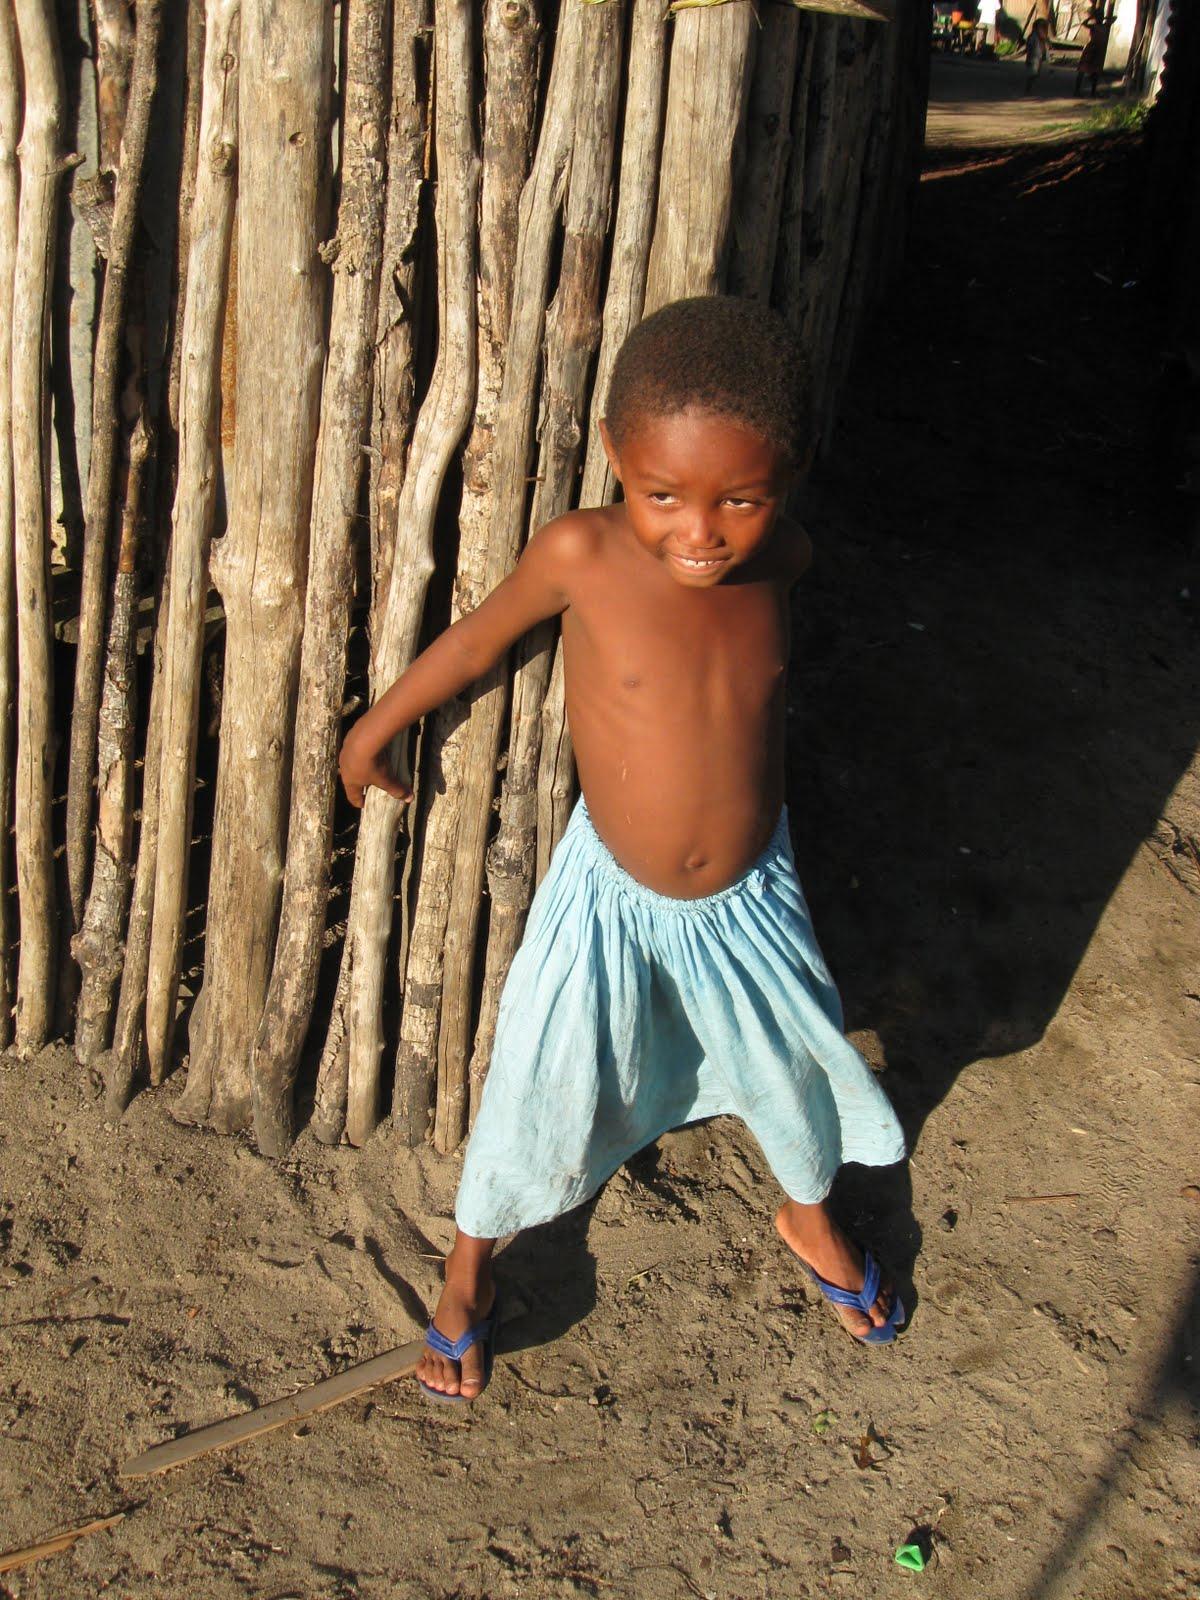 http://1.bp.blogspot.com/_56_0QZgR3nI/THYiLMeMhpI/AAAAAAAABZc/cjjeoxZzsYc/s1600/Del+Paradiso+2+foto+Nosy+Be+Madagascar+lug+2009+390.jpg